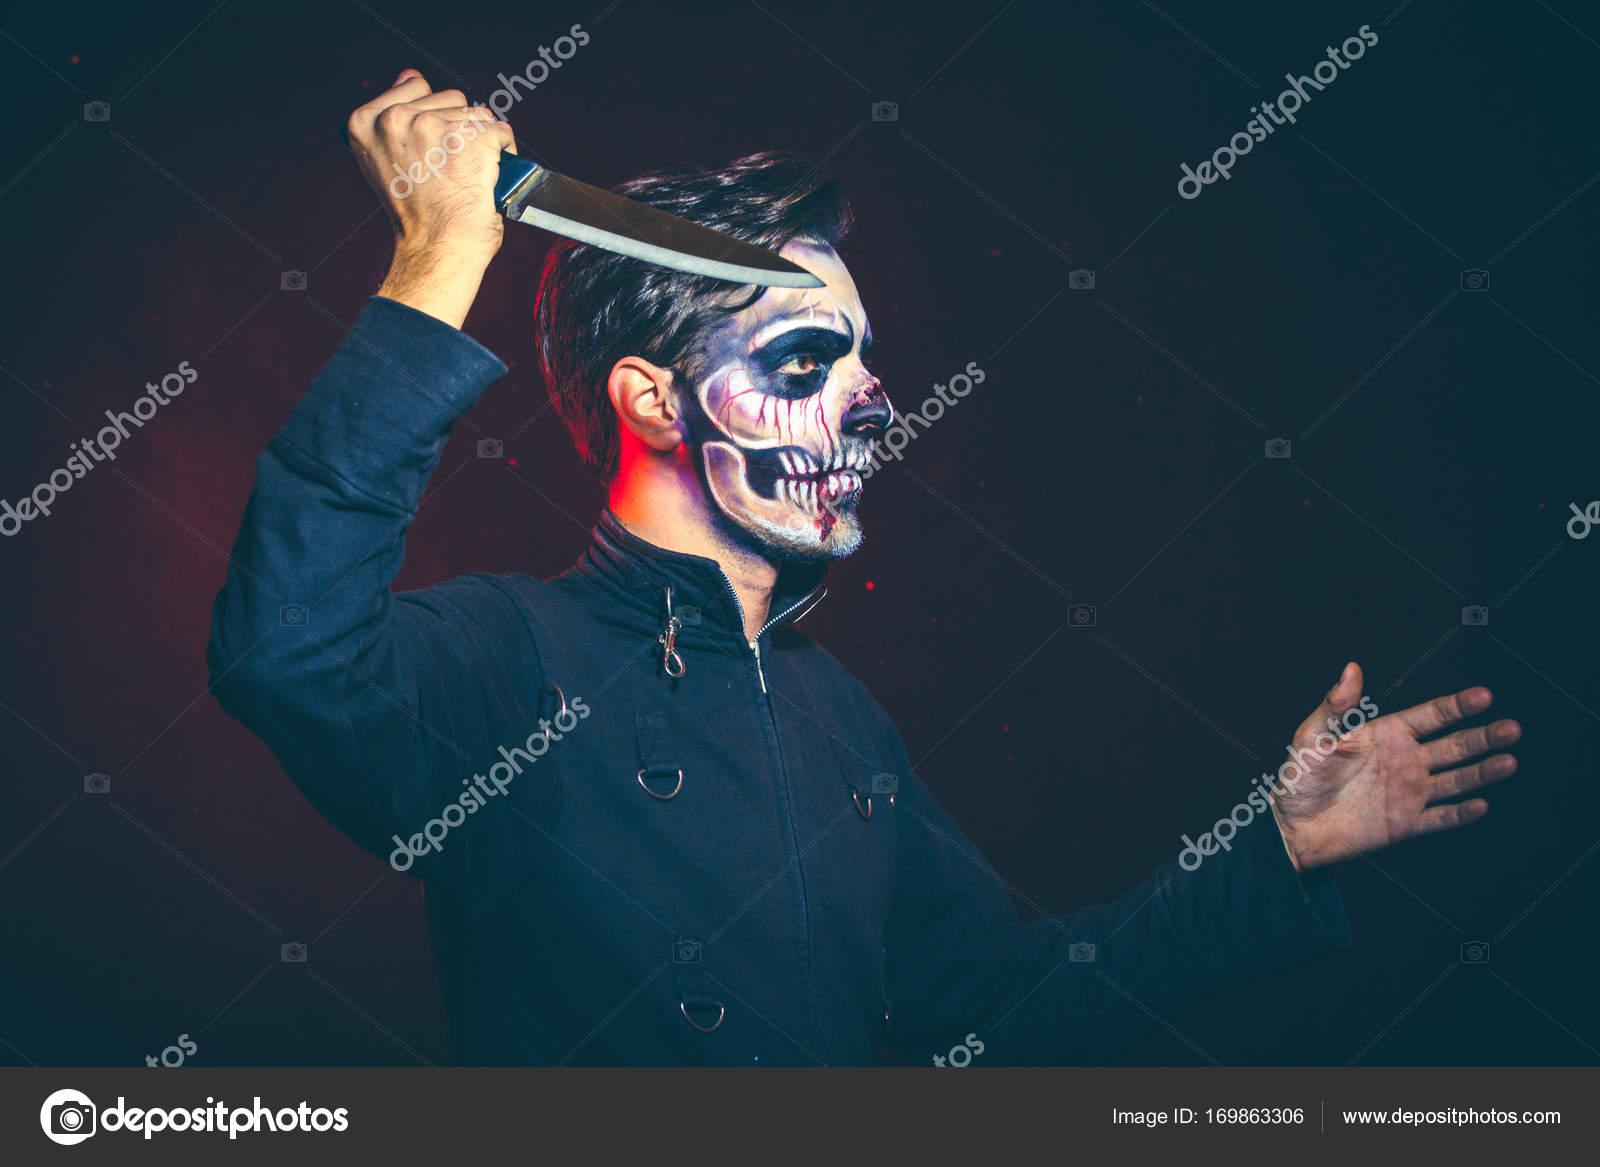 Sho Avec Homme Homme Homme Couteau Effrayant Effrayant Effrayant Studio Halloween Squelette Grand 0xqxw7vt